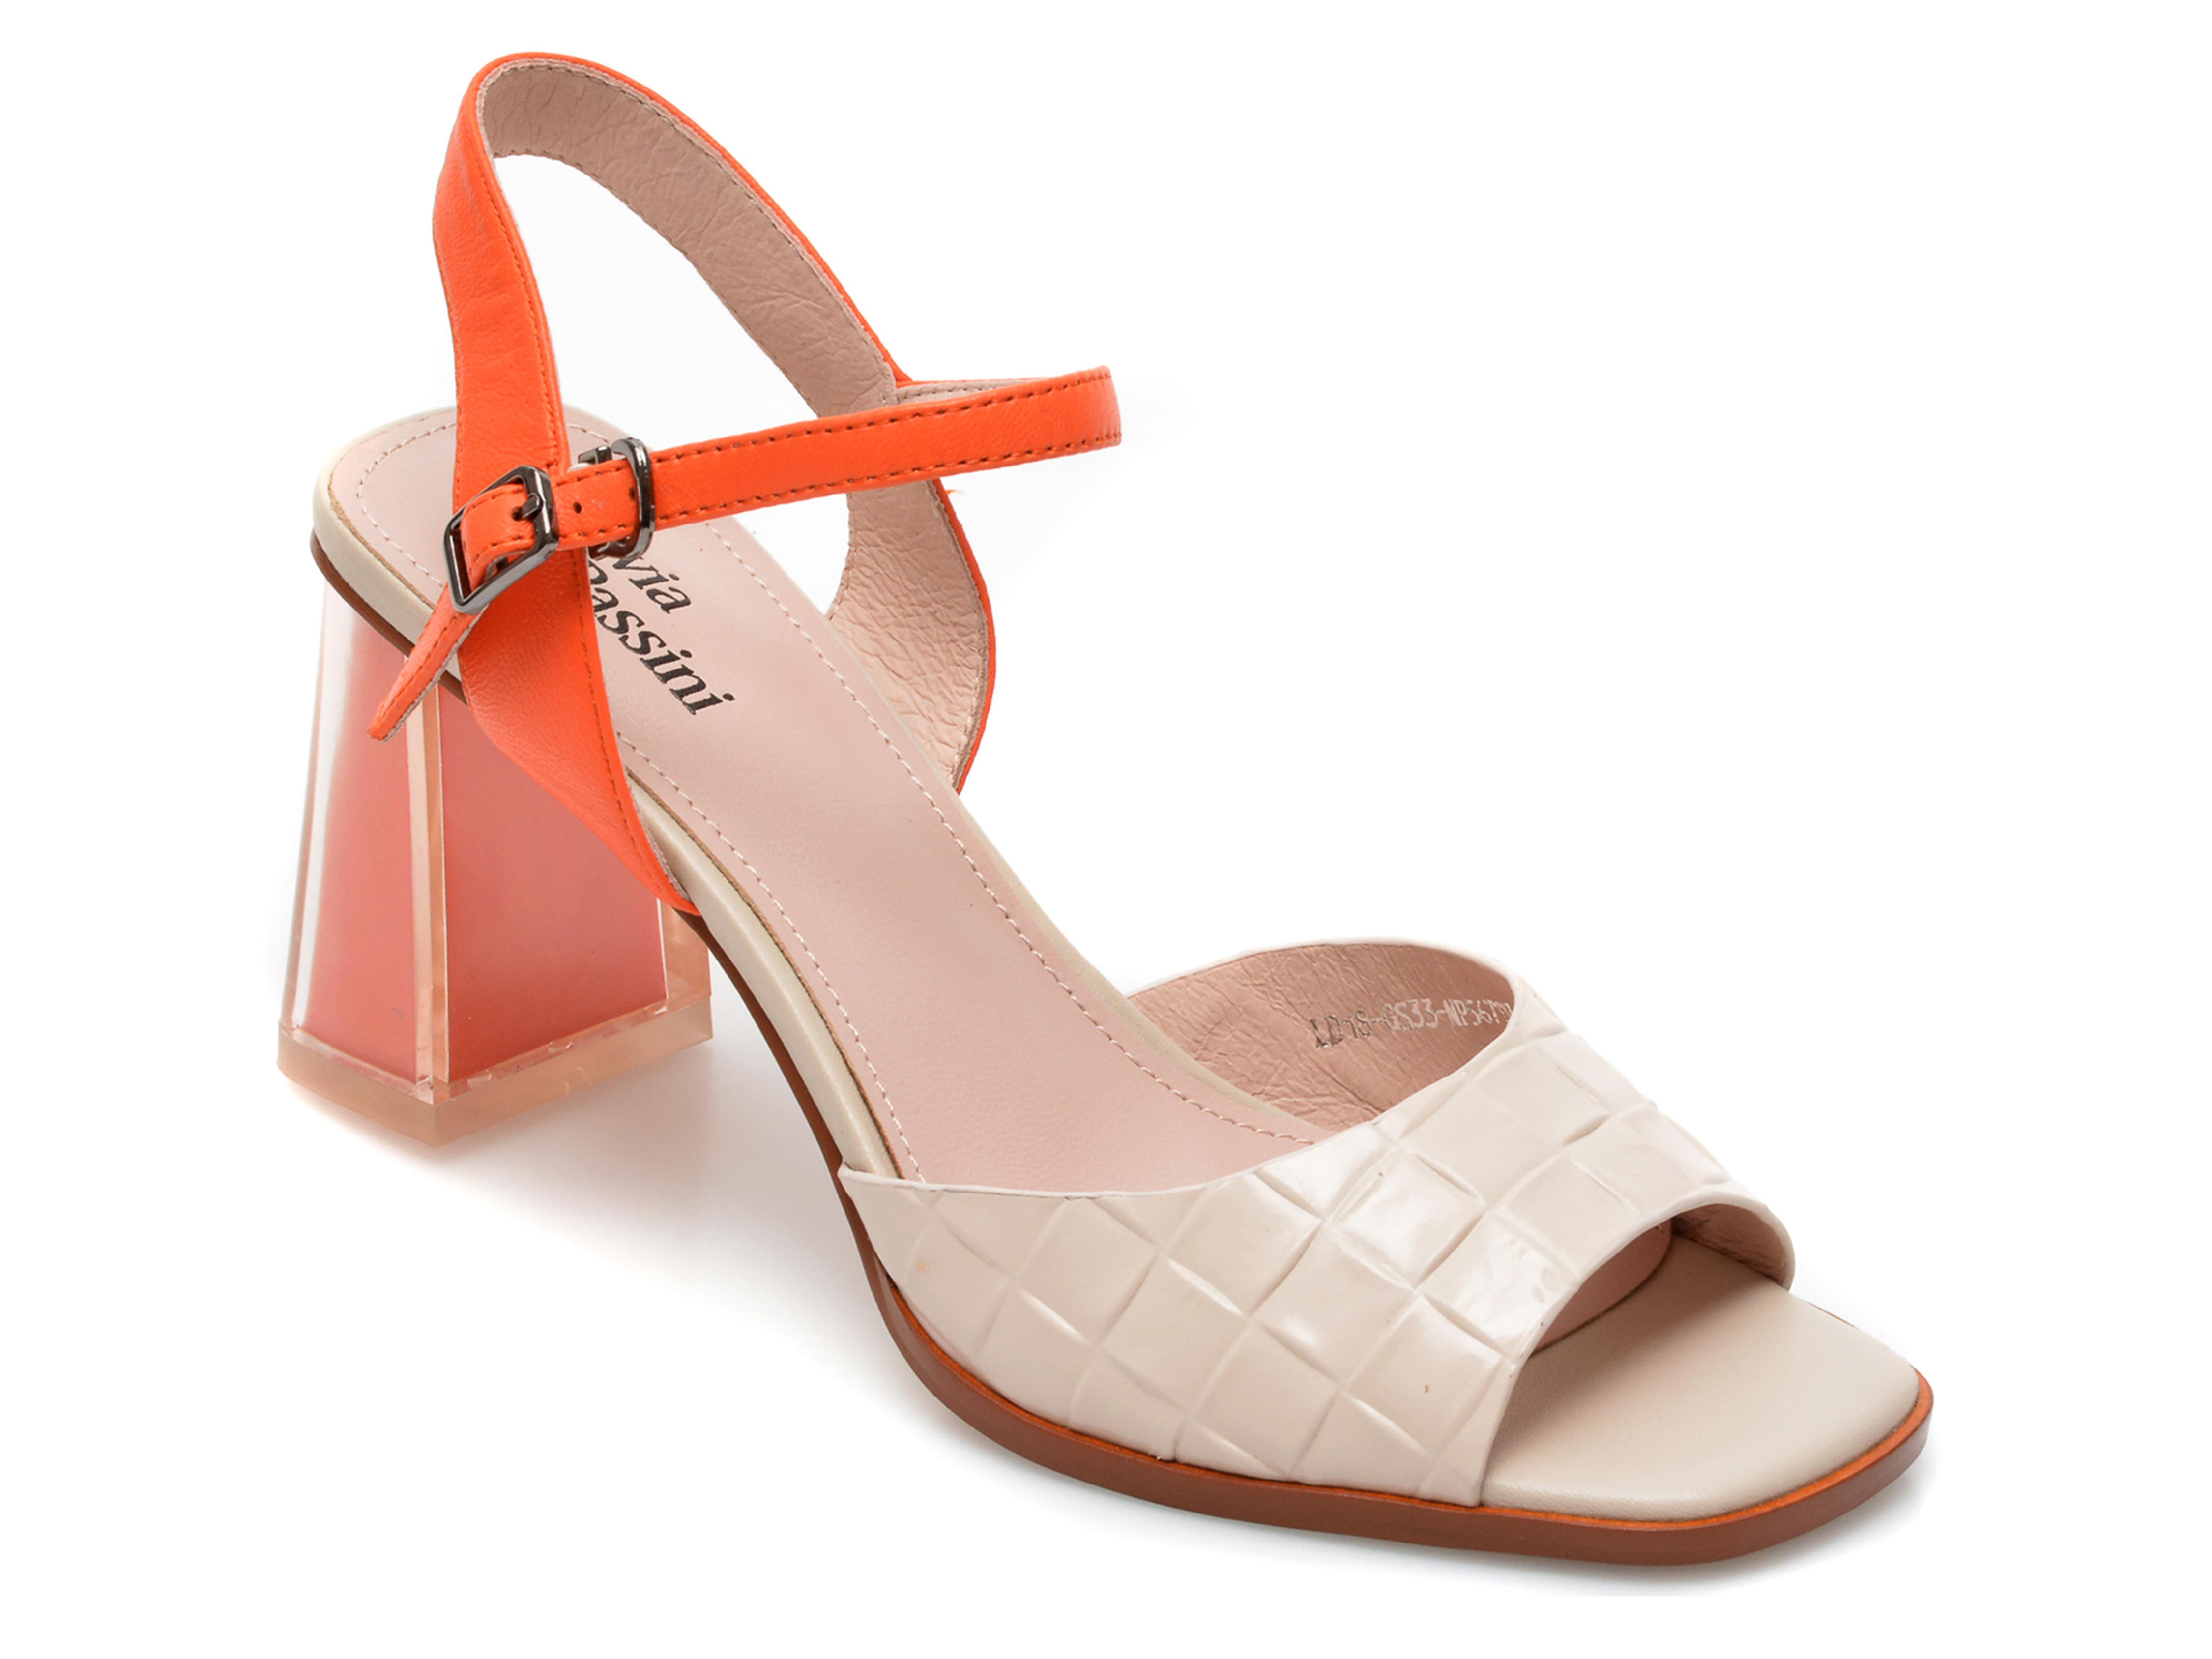 Sandale FLAVIA PASSINI bej, LD18GS3, din piele naturala